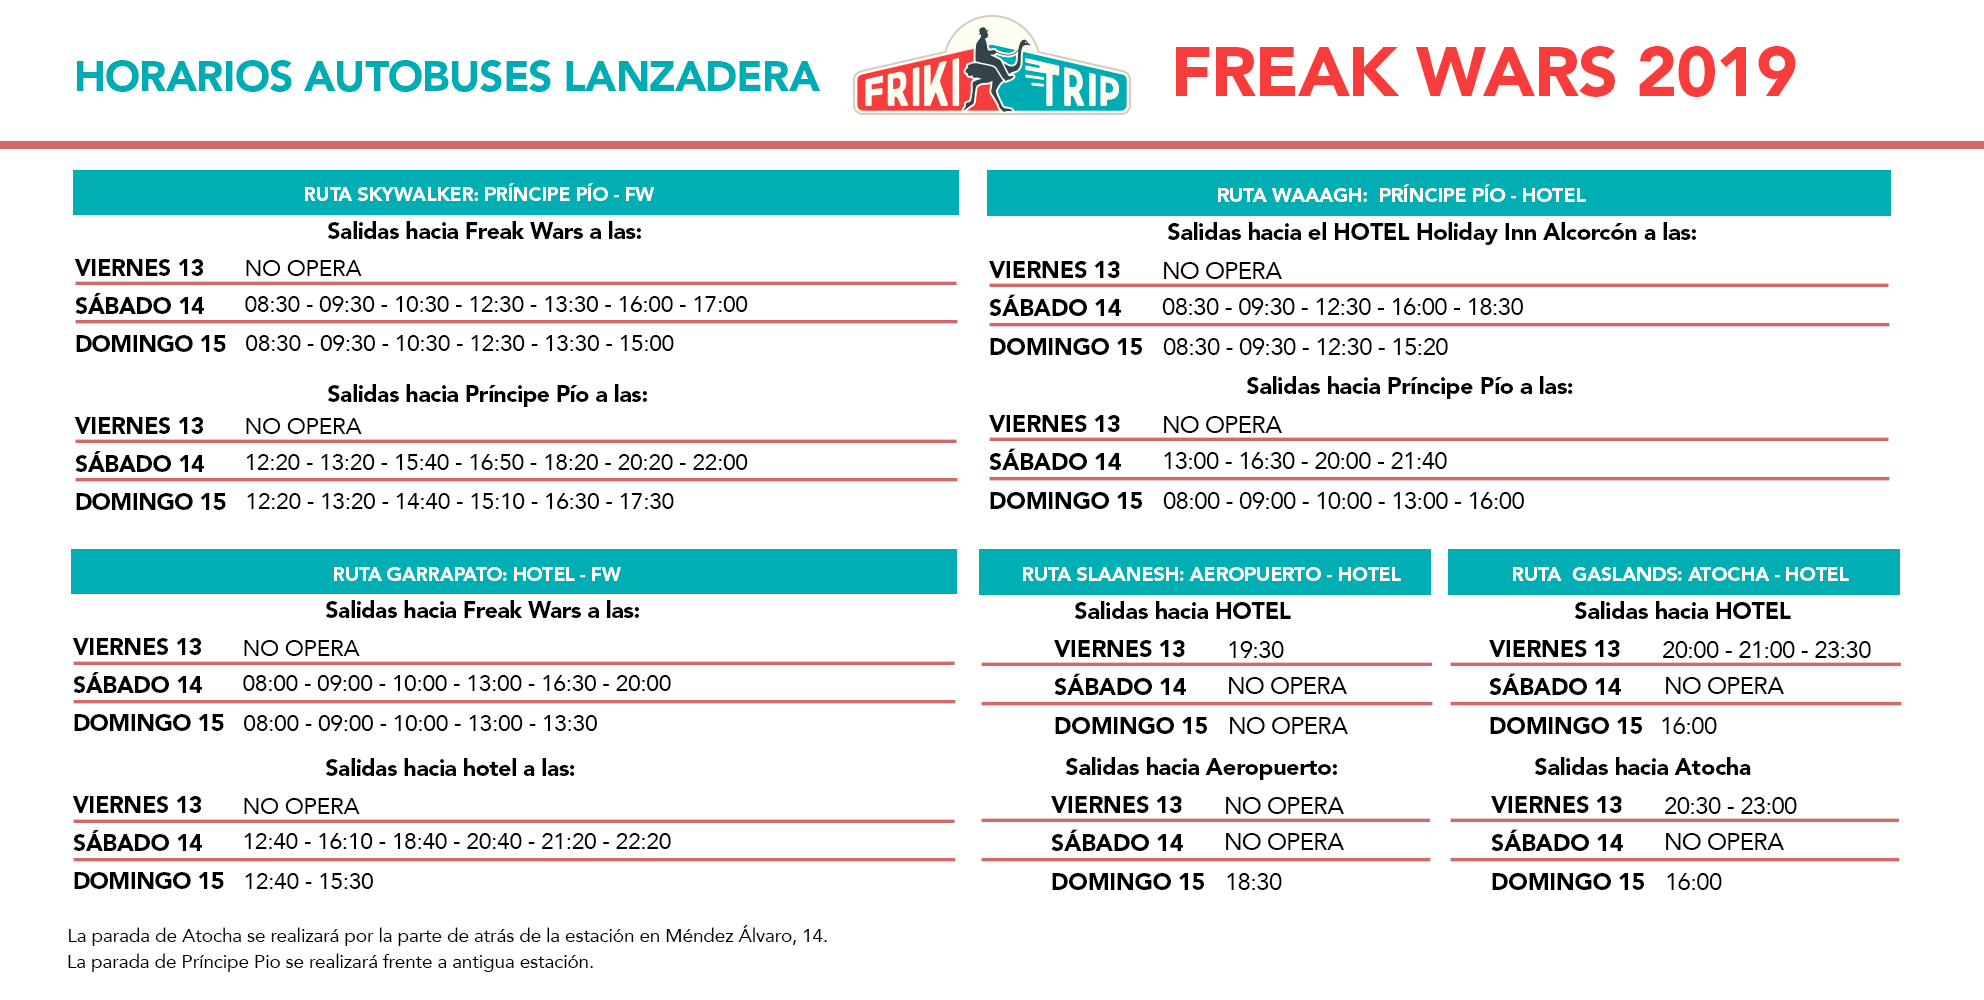 Autobuses gratuitos Freak Wars 19